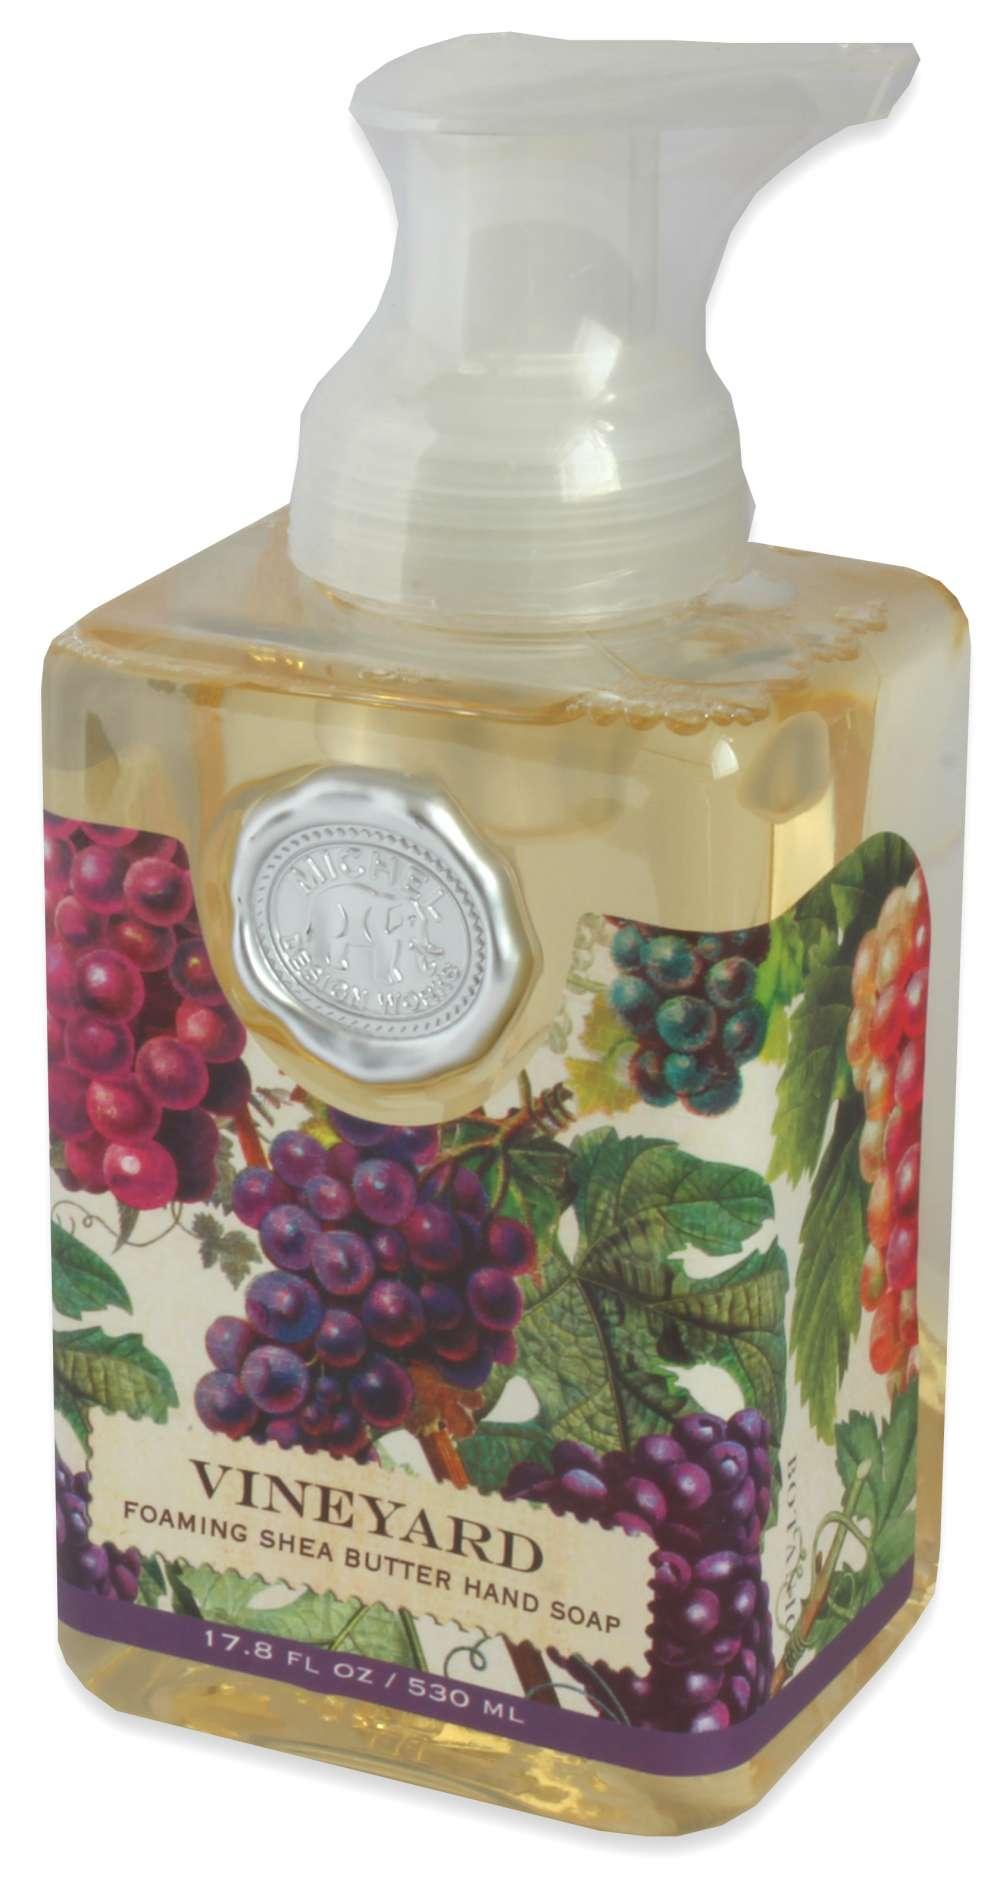 Michel Design Works - Vineyard Foaming Hand Soap